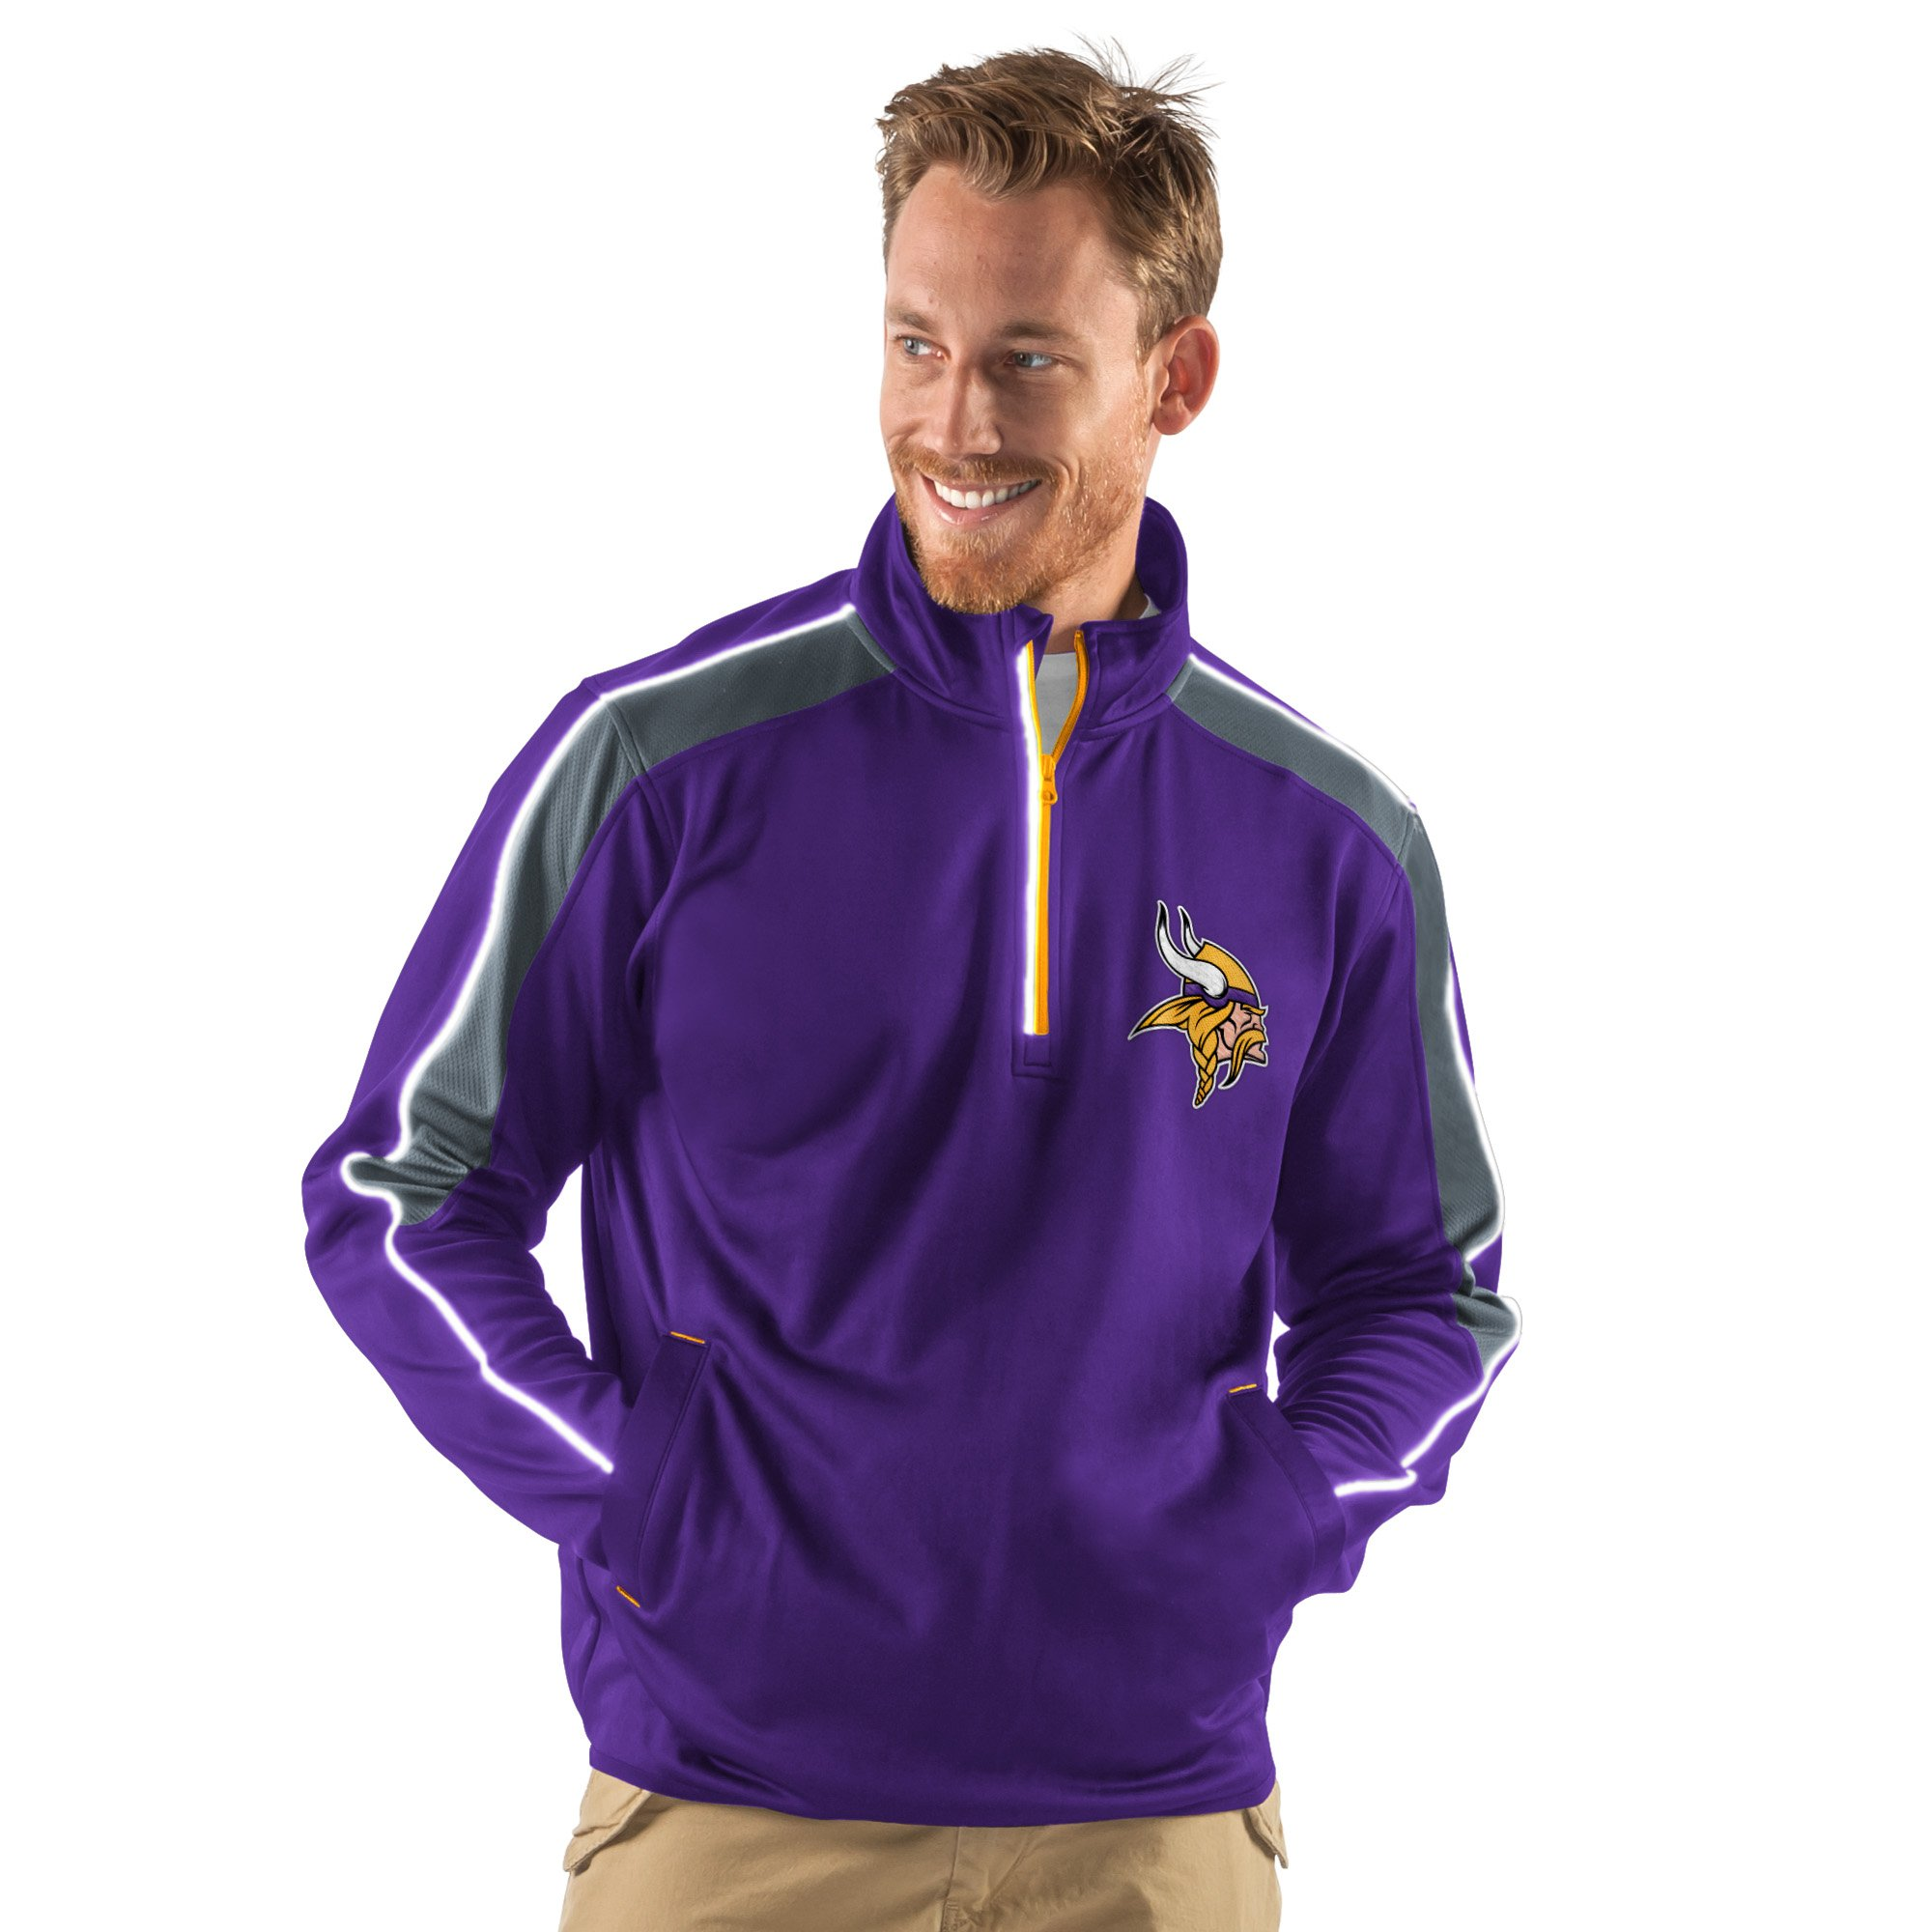 Minnesota Vikings Purple Discover Half Zip Pullover Jacket by G-III Sports